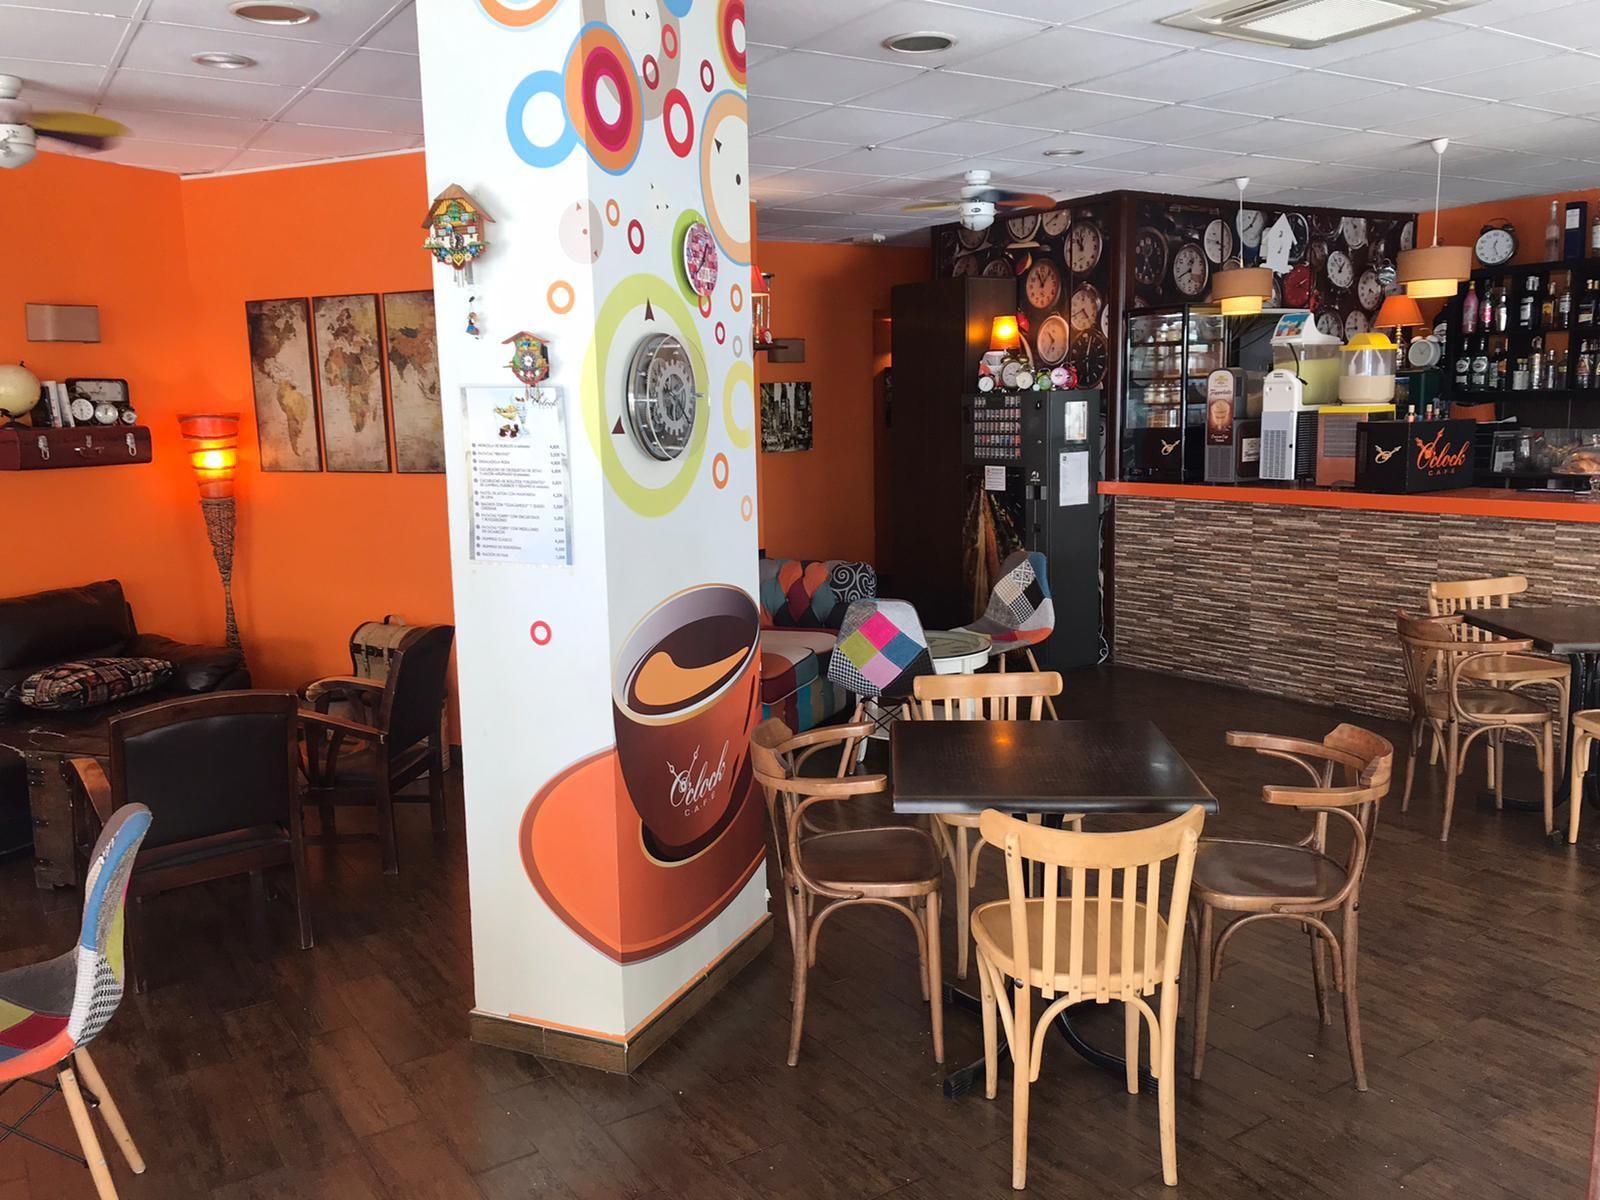 Foto 47 de Restaurante en Valencia | Cafetería Tosteria O´Clock